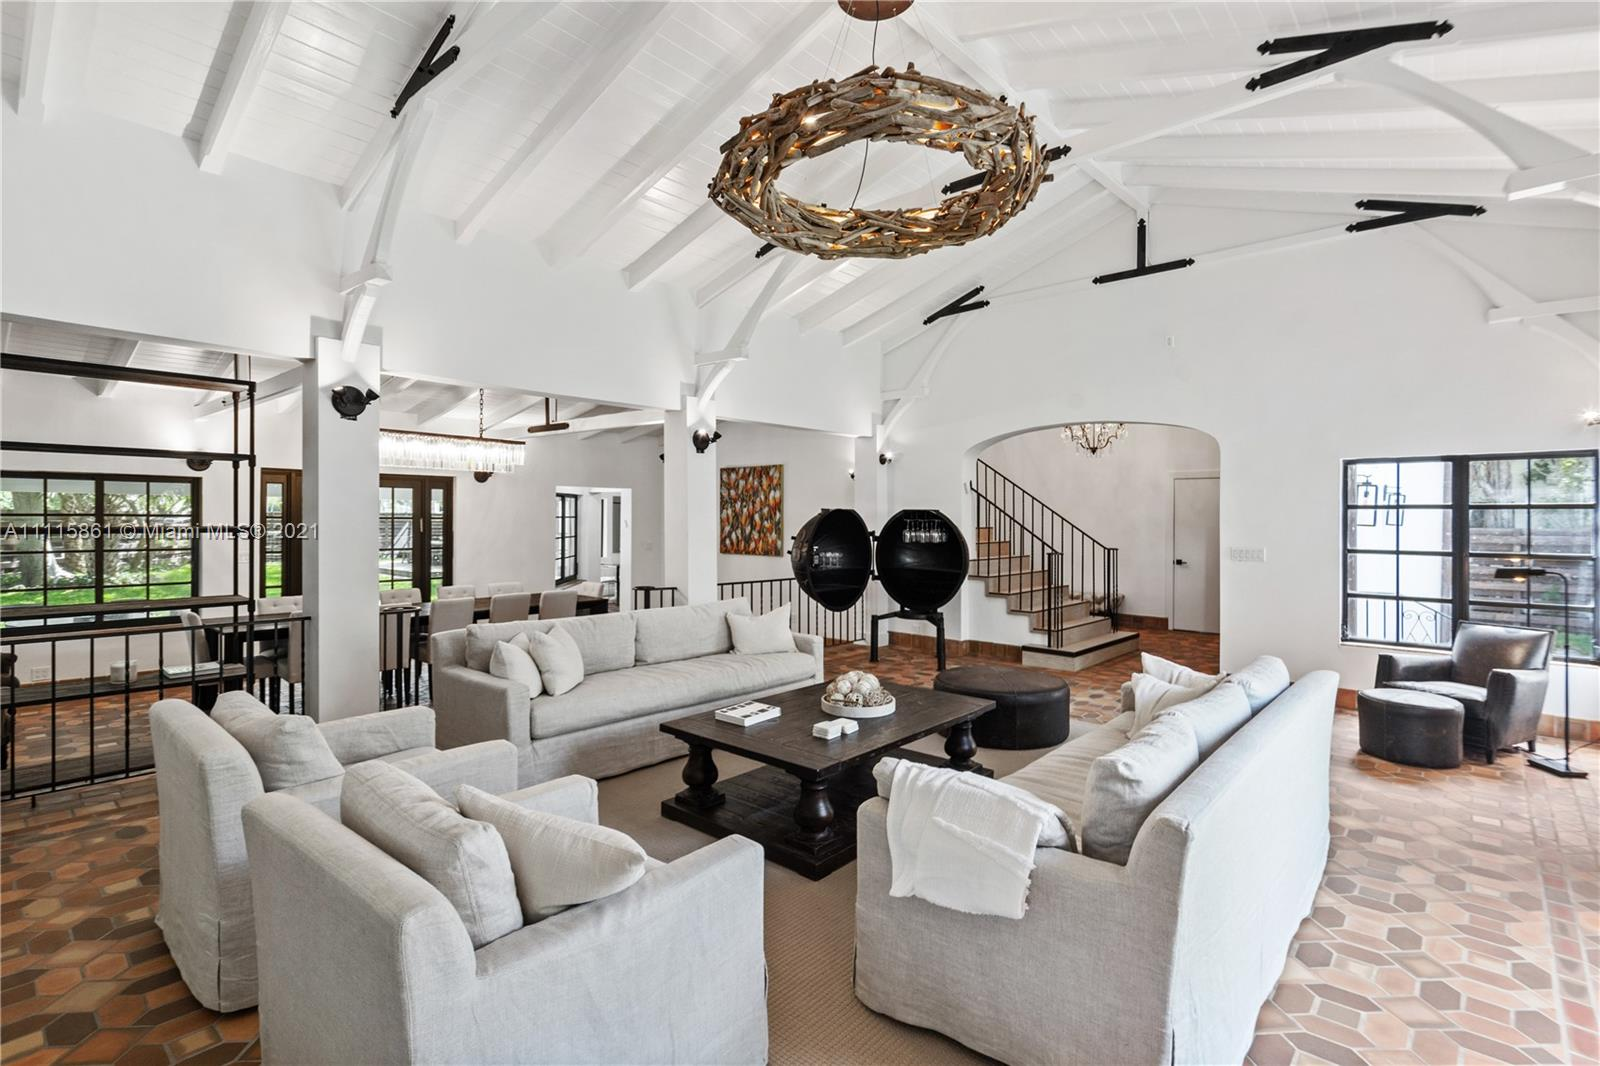 Single Family Home,For Rent,2655 Pine Tree Dr, Miami Beach, Florida 33140,Brickell,realty,broker,condos near me